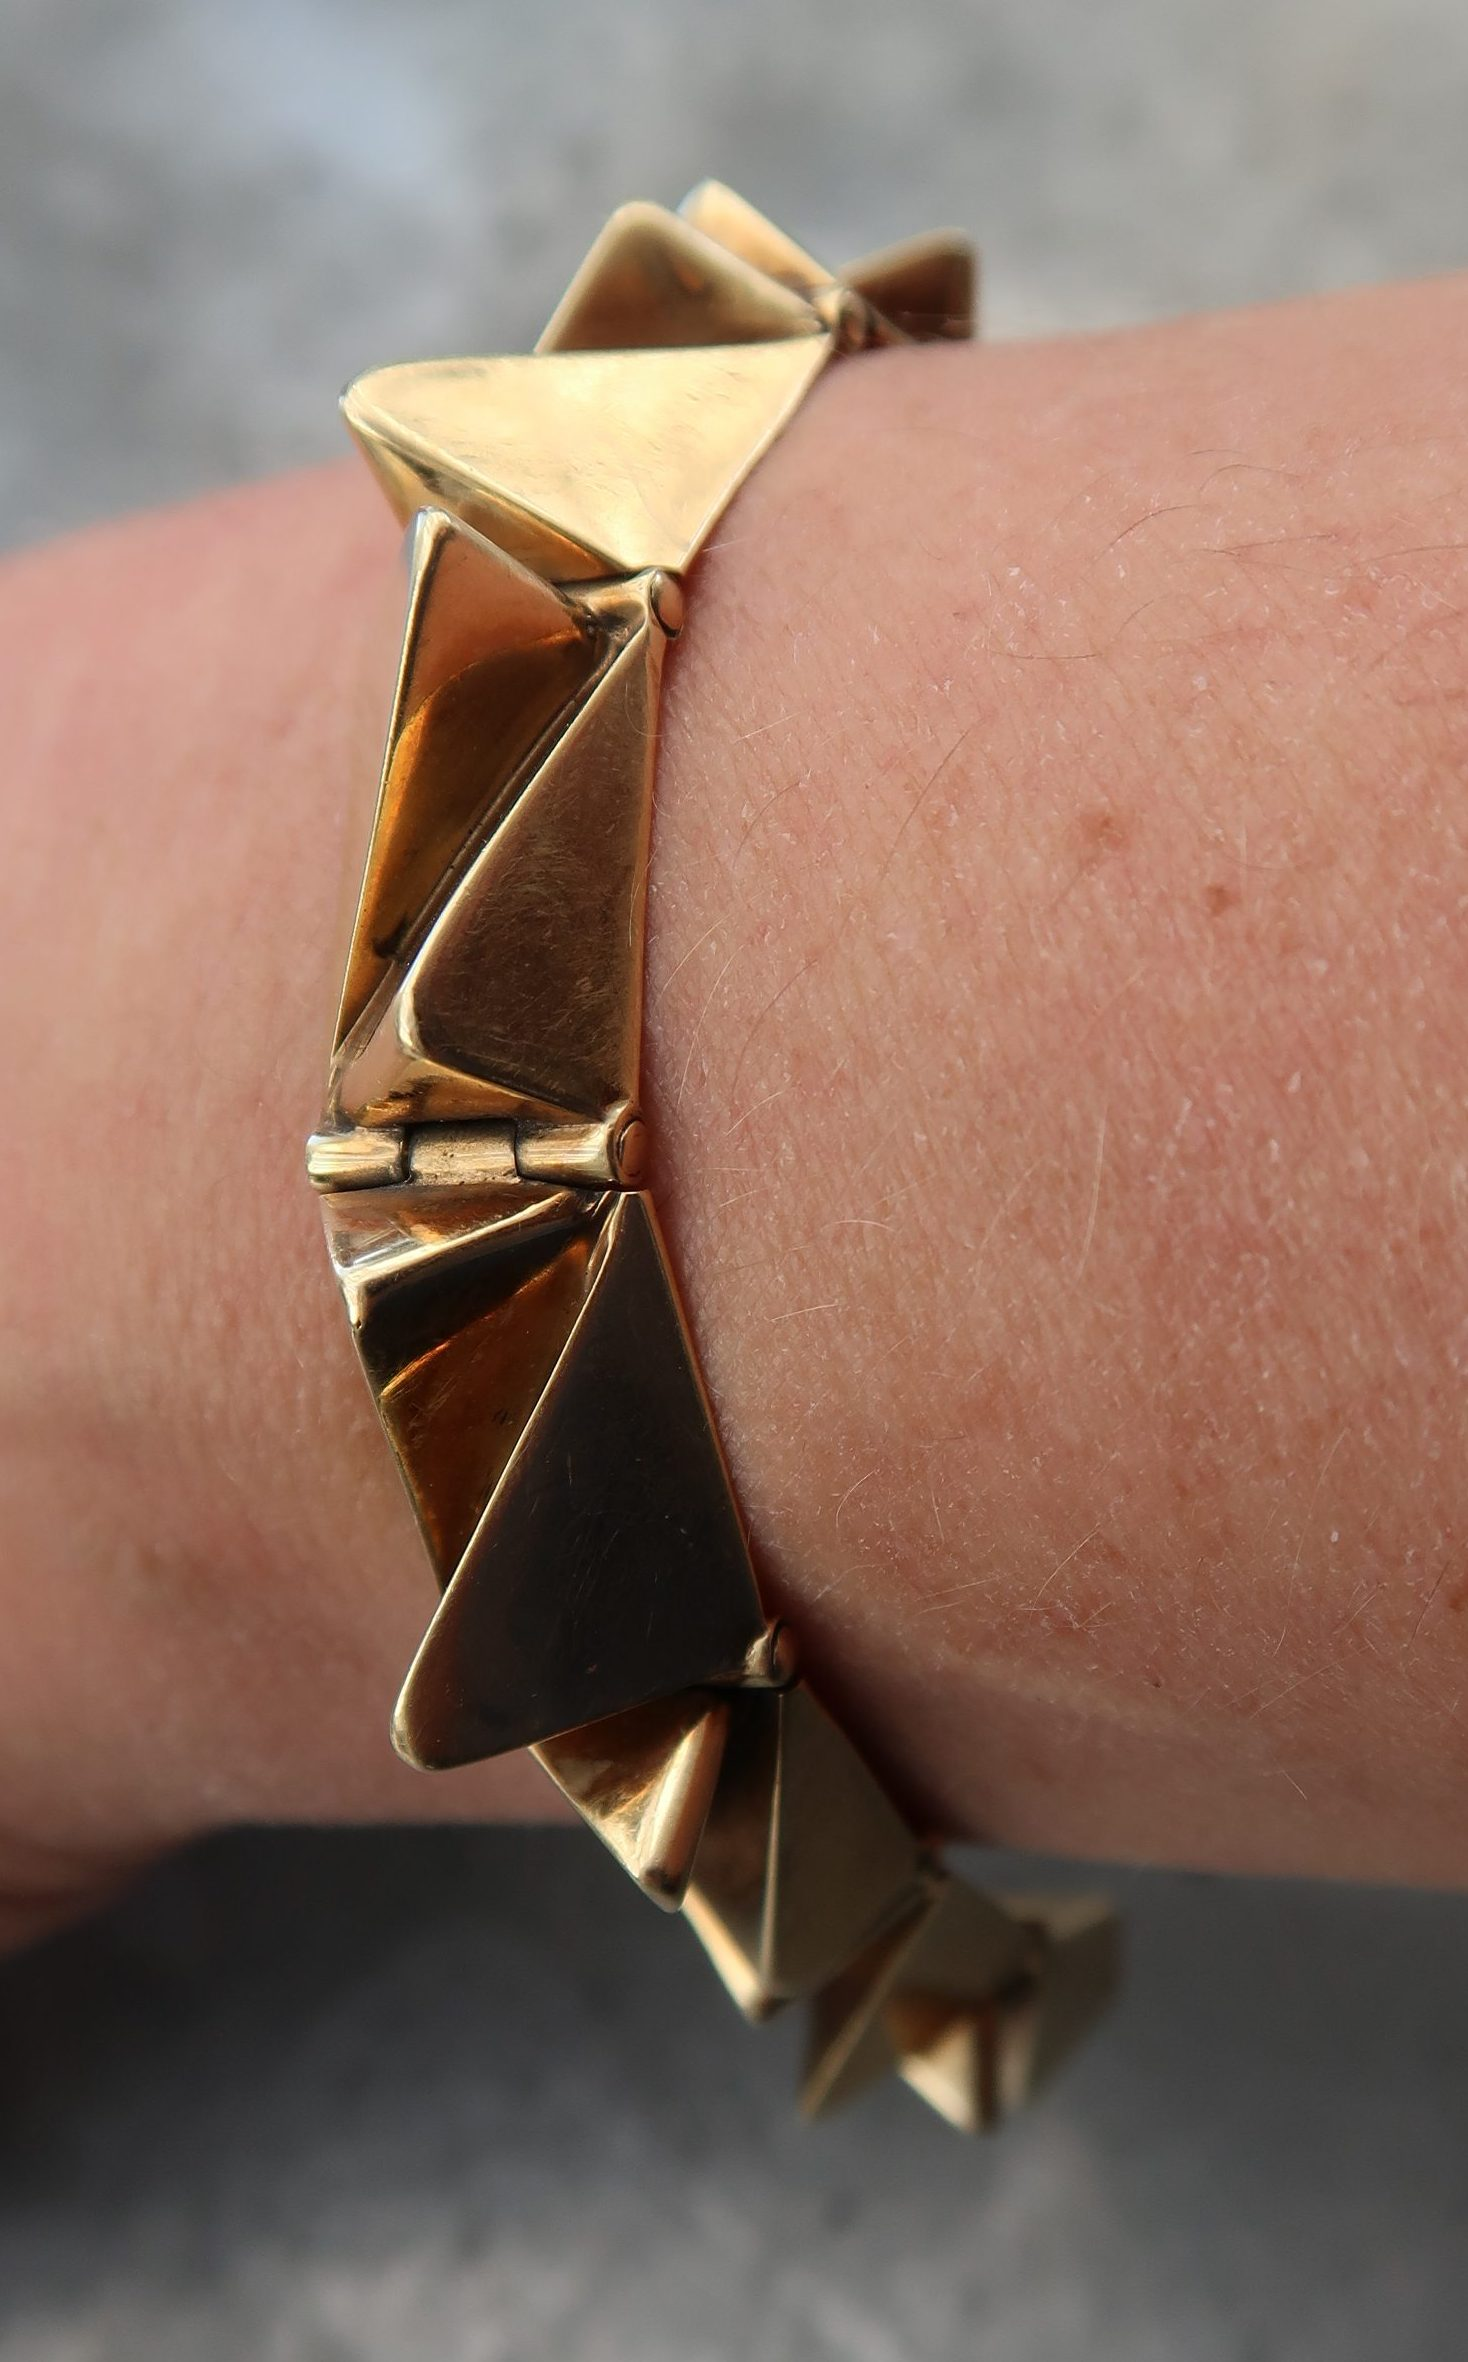 Karel Niehorster, armband, 1967. Particuliere collectie. Foto Coert Peter Krabbe, goud